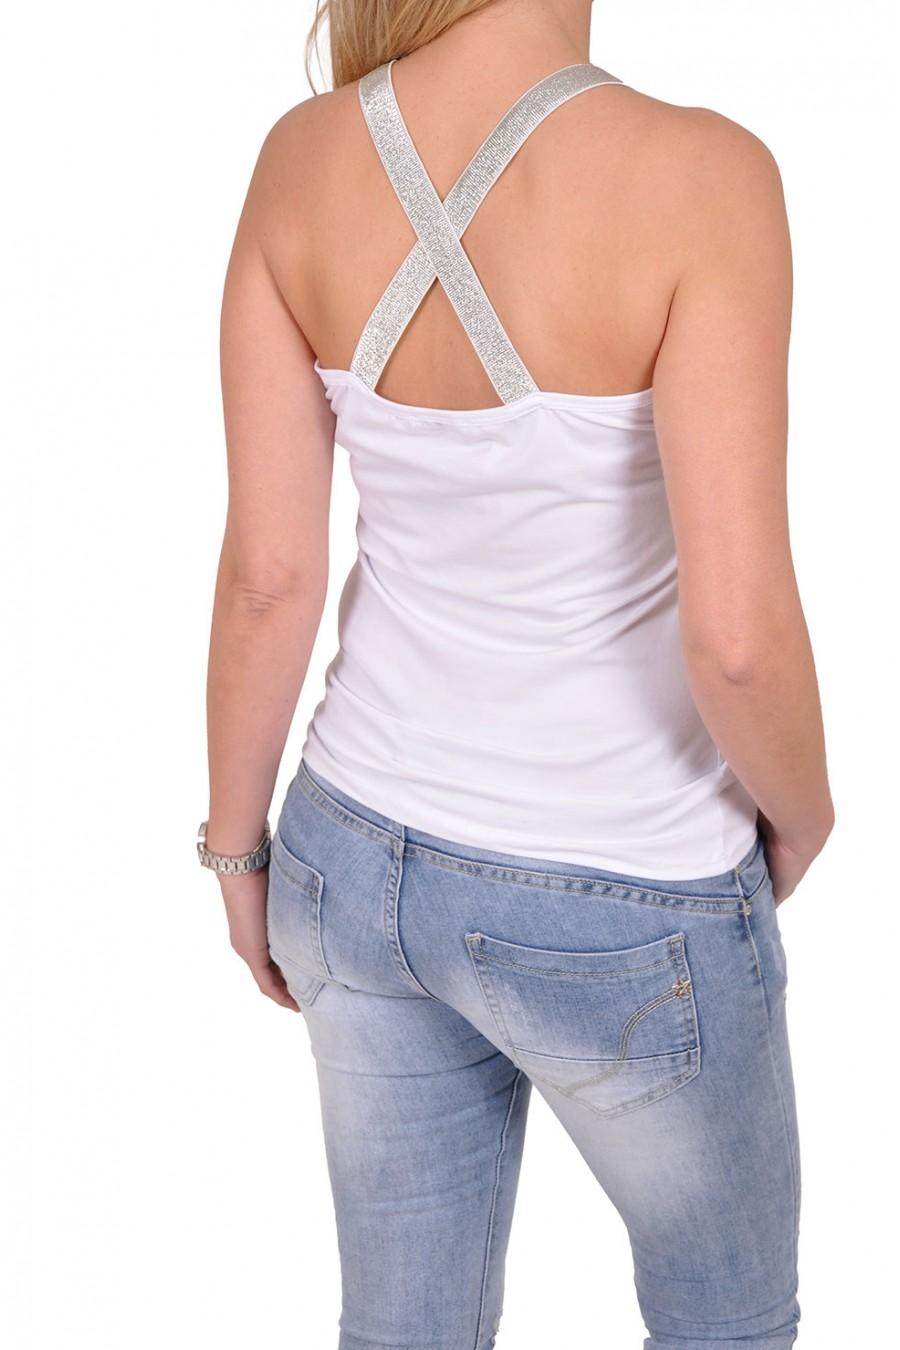 Gekruiste X top wit-zilver Eva Fashion